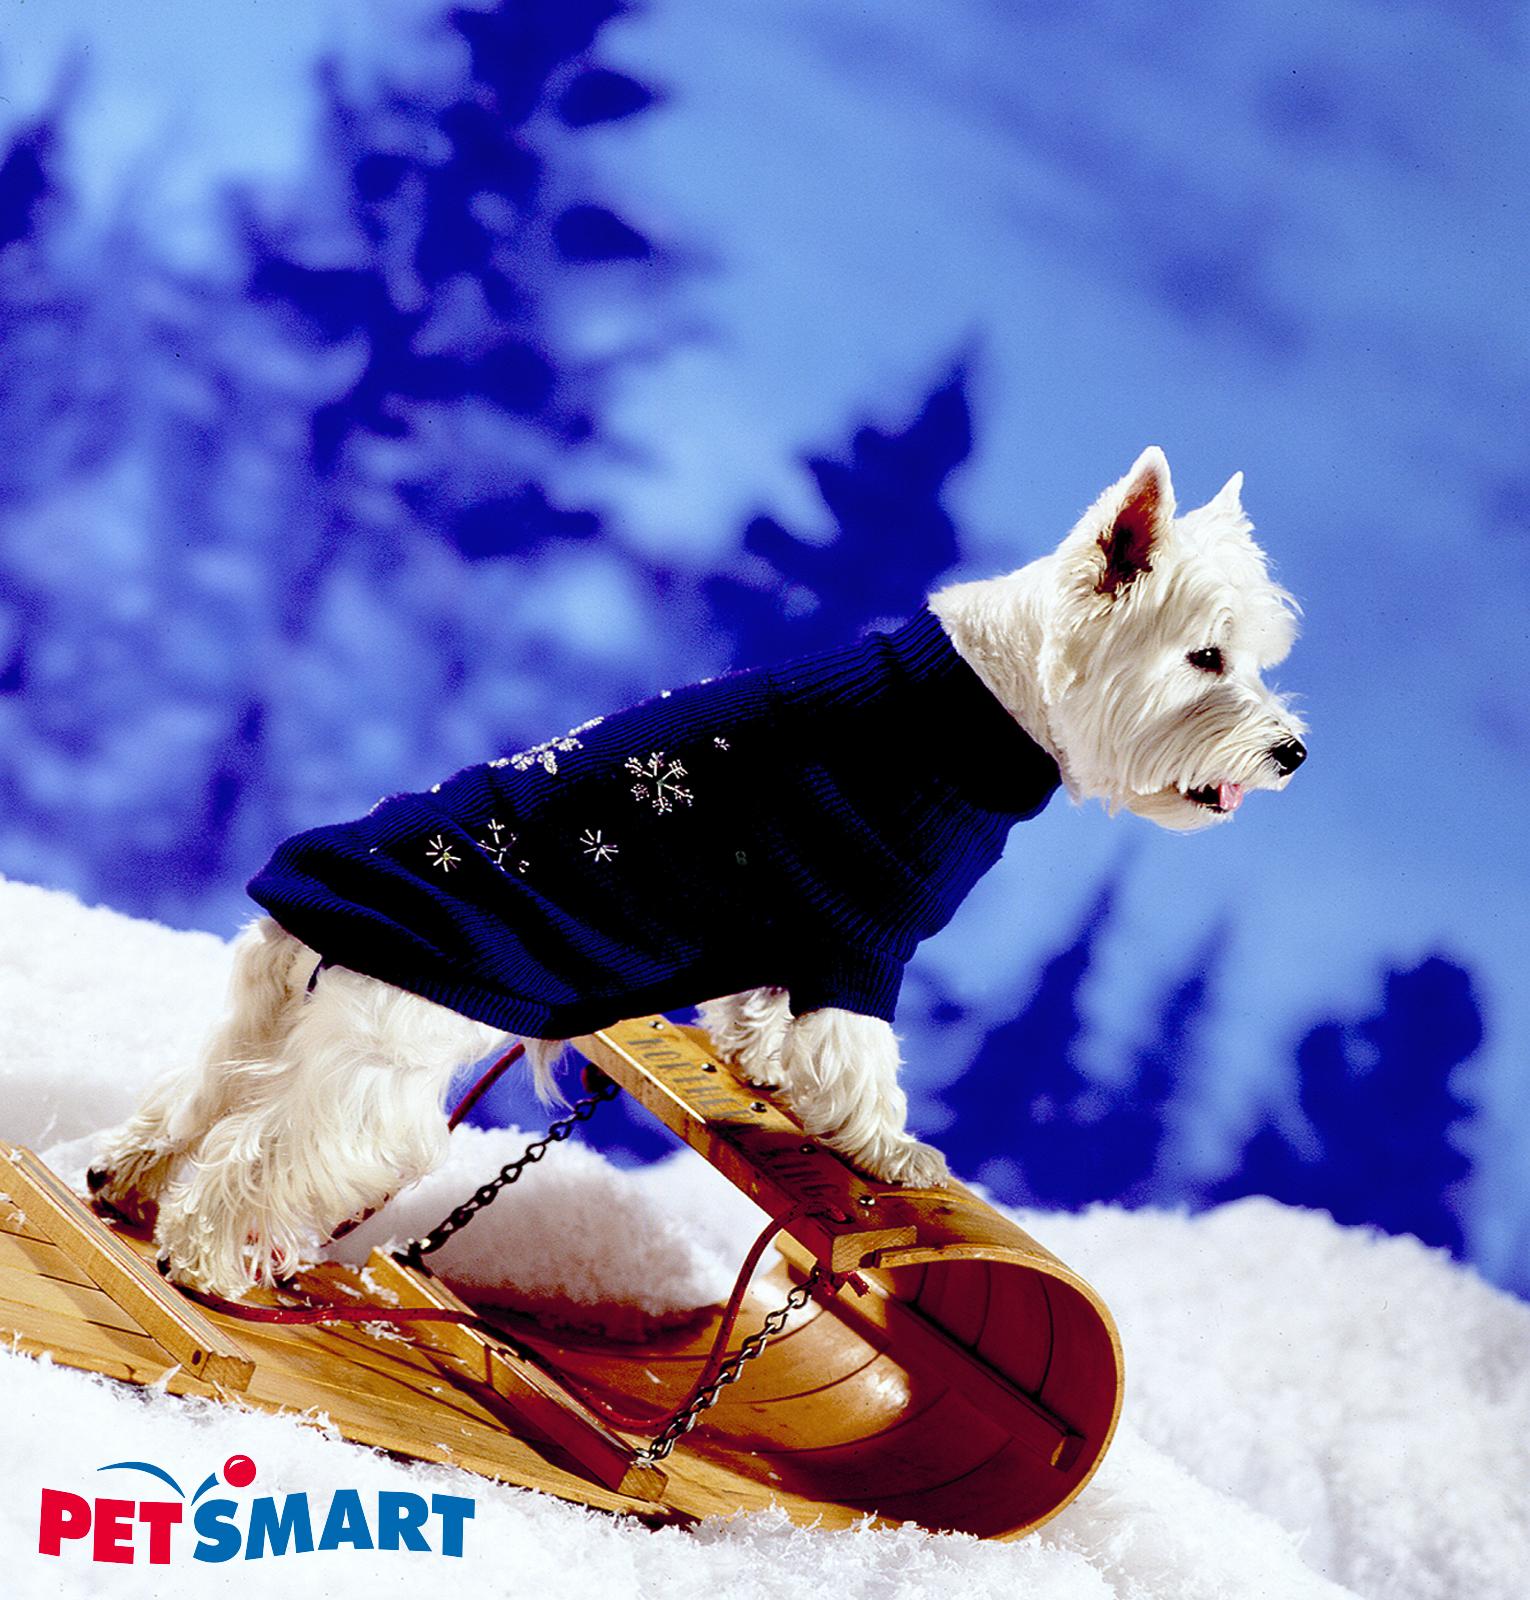 Petsmart Down Hill Dog